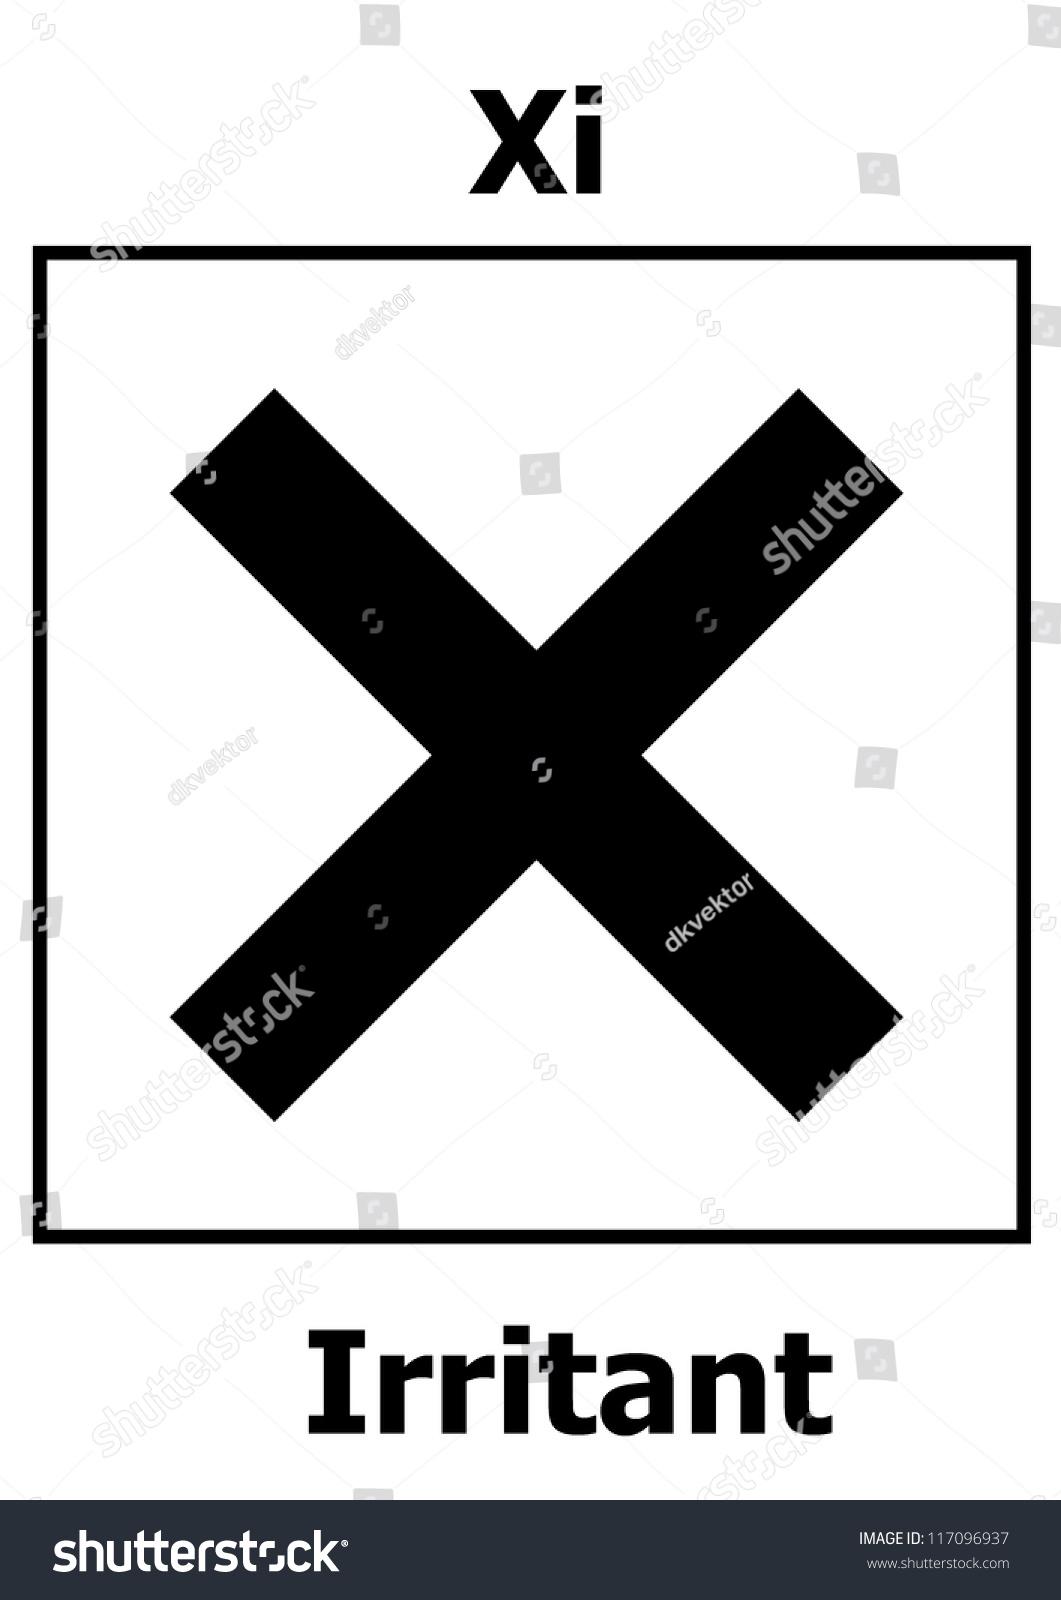 Hazard symbol irritant stock vector 117096937 shutterstock hazard symbol irritant biocorpaavc Gallery